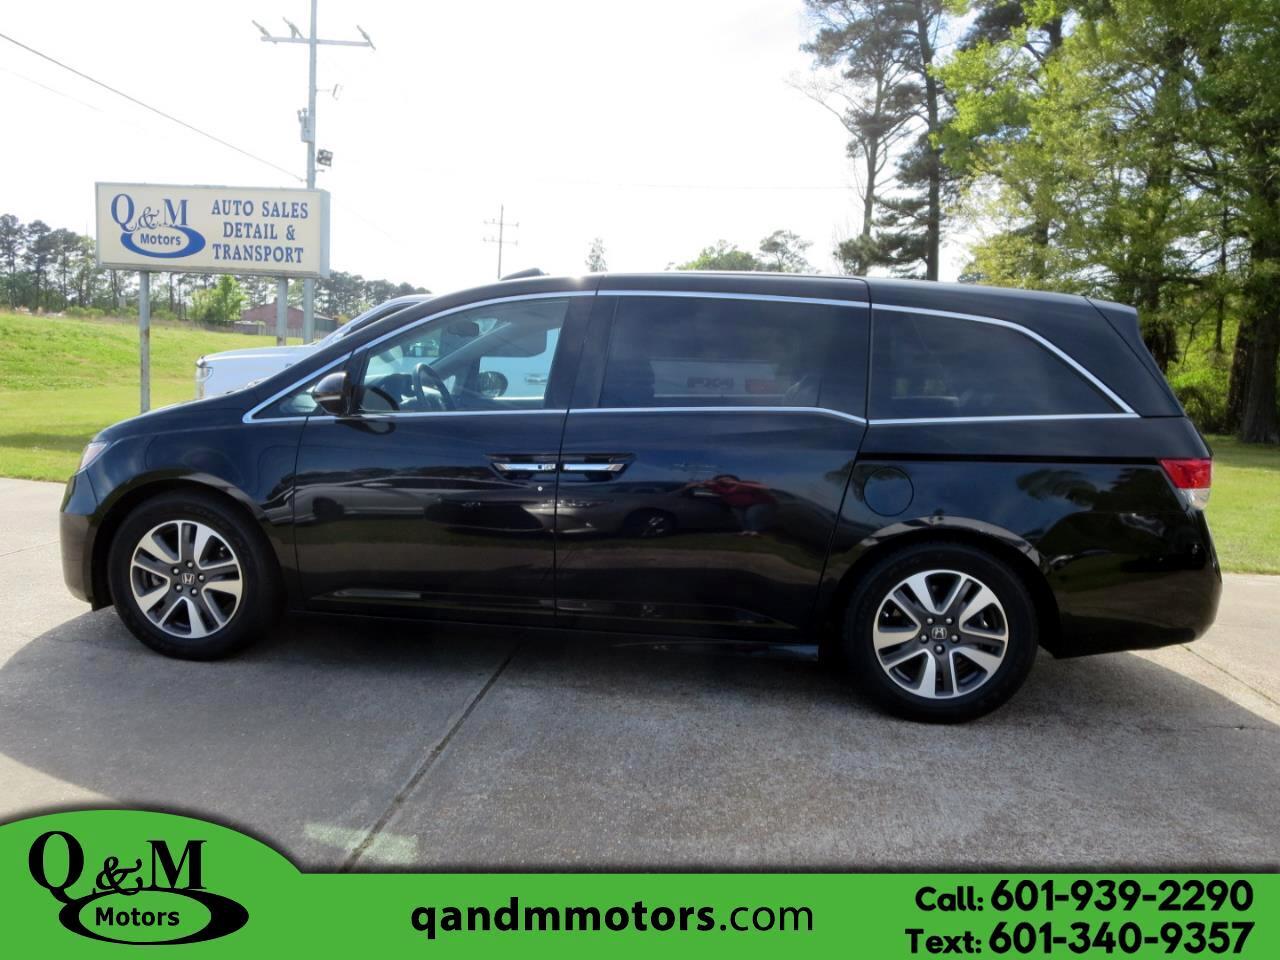 2014 Honda Odyssey 5dr Touring Elite